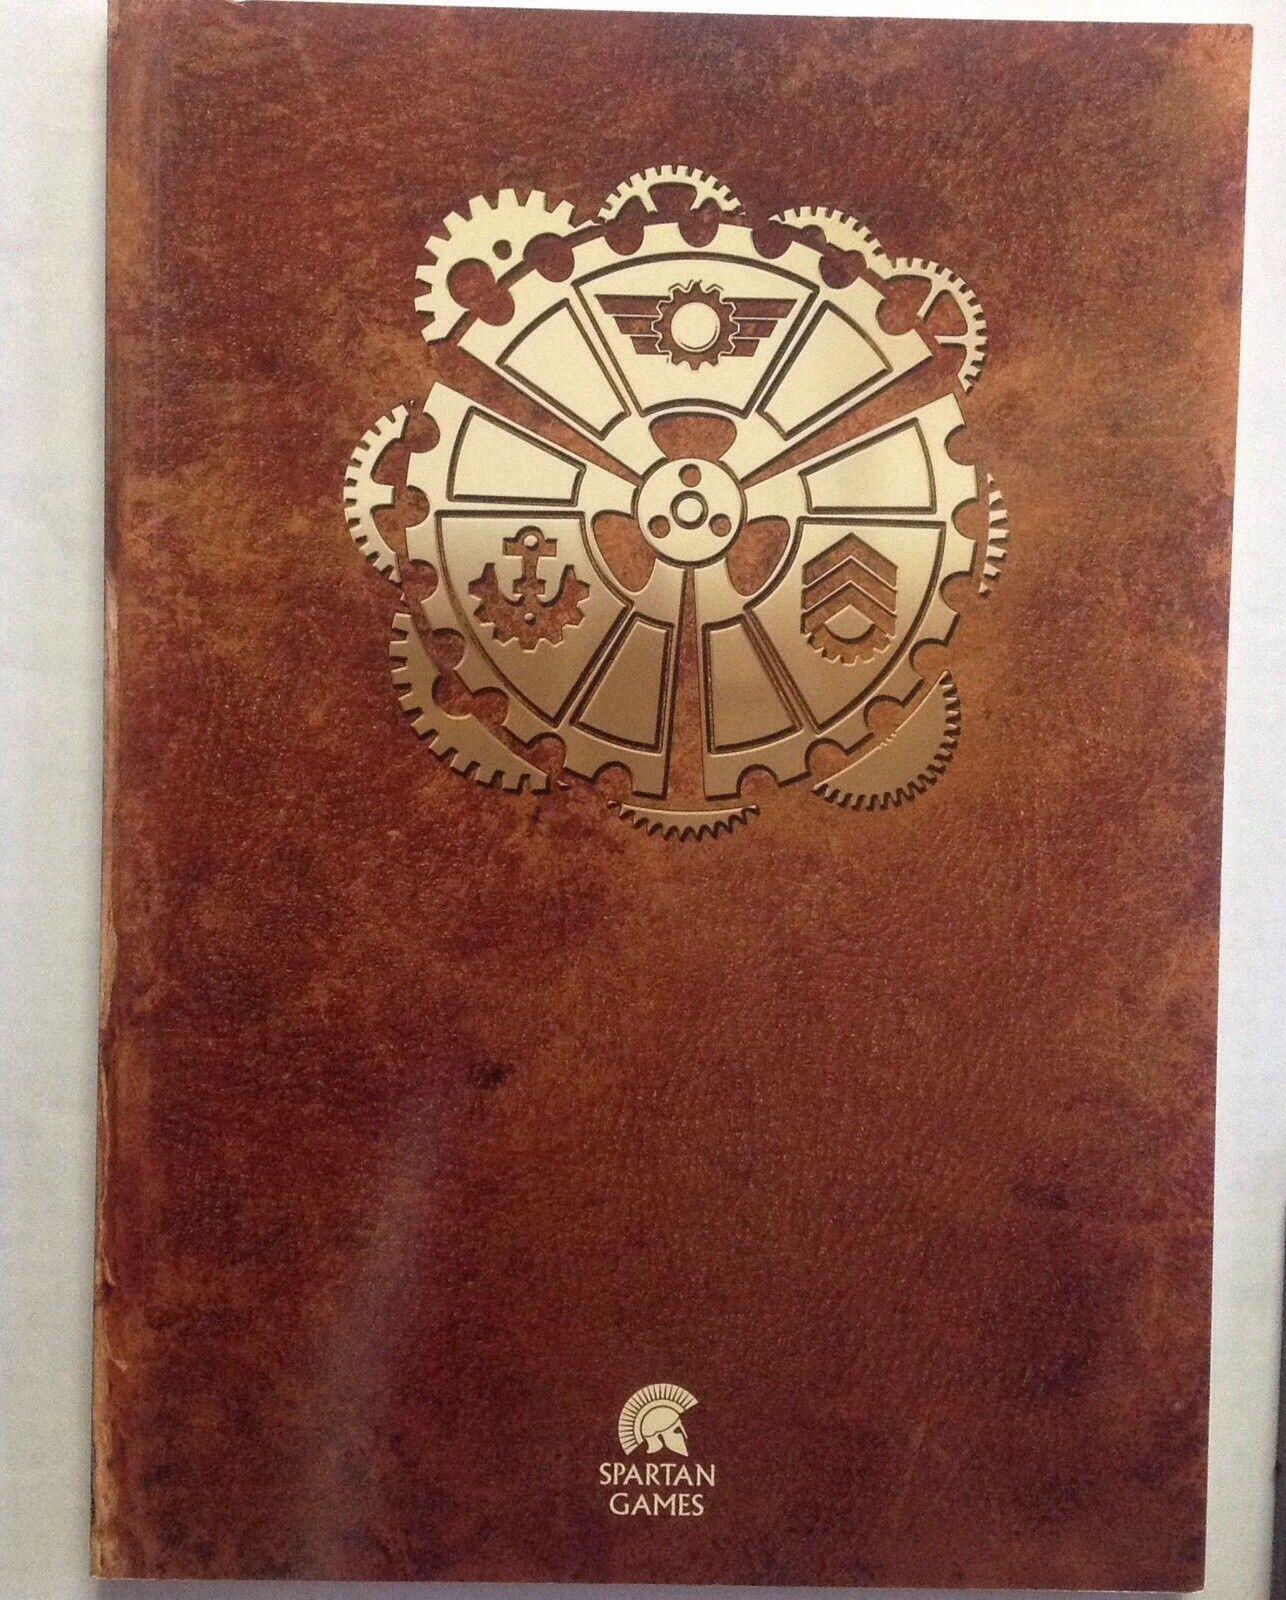 Dystopian Wars Admiral Edition Core Rulebook. Spartan Games.